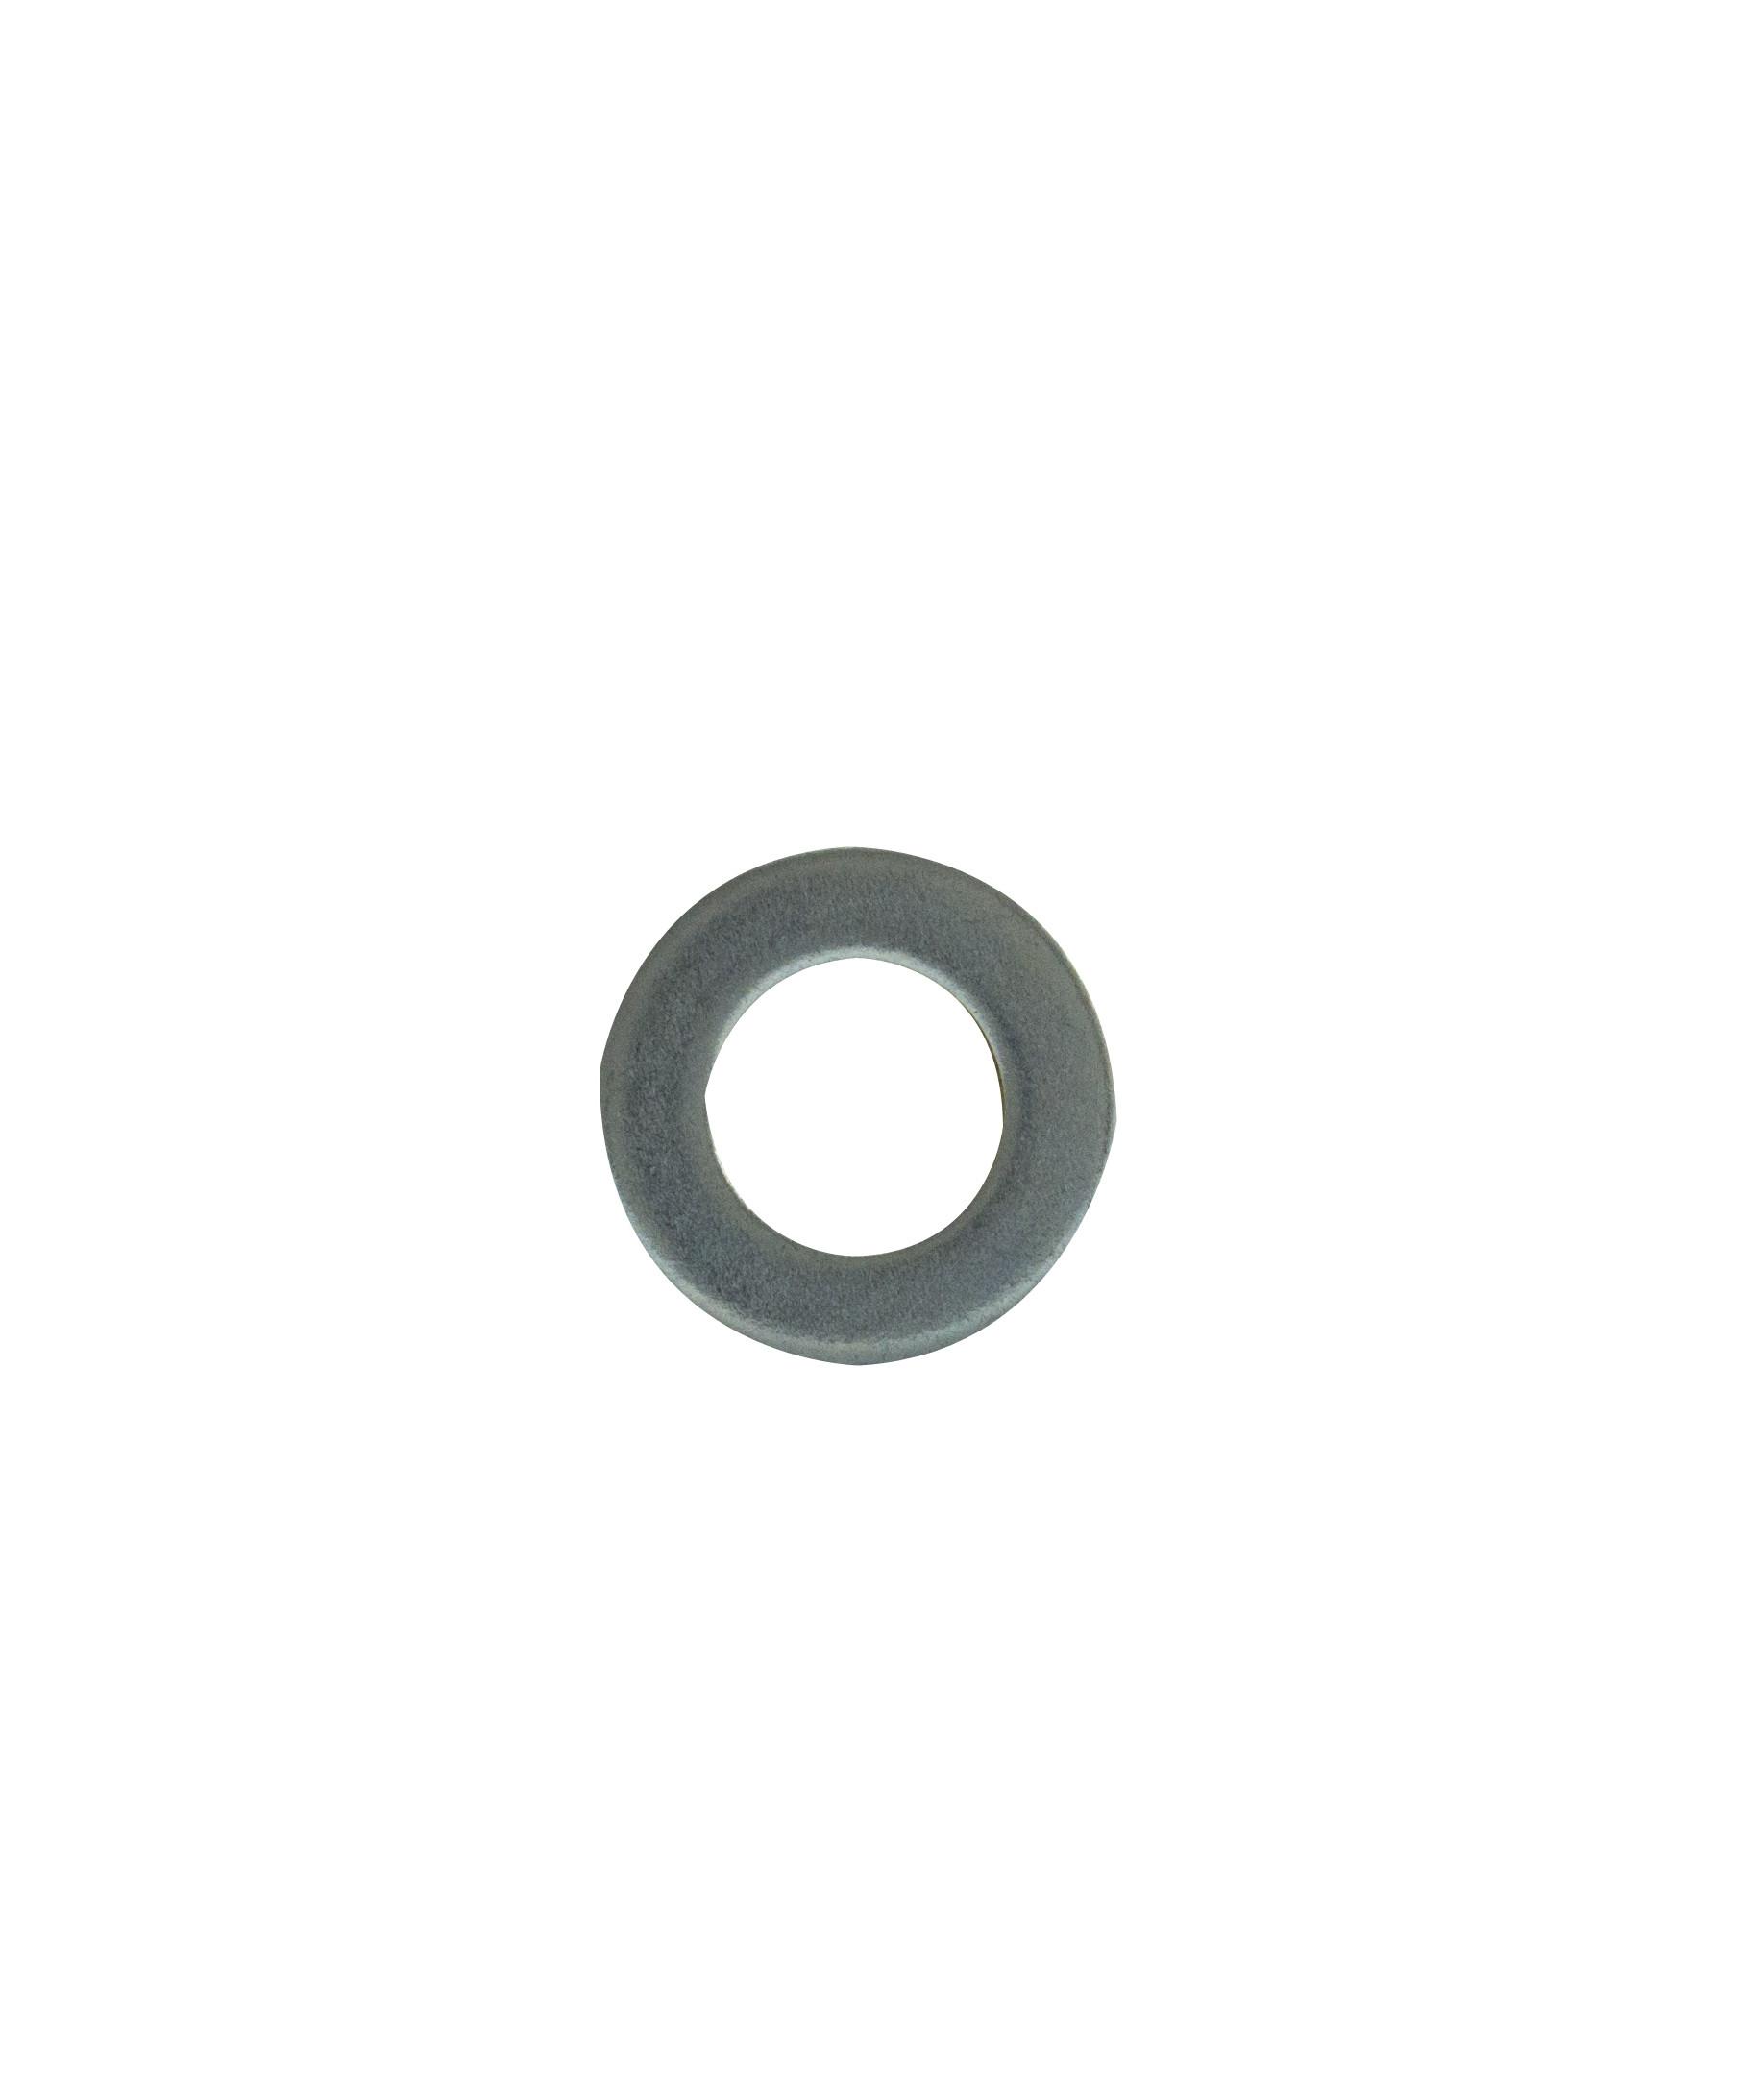 M6 Metric Flat Washer DIN 125A BZP ***